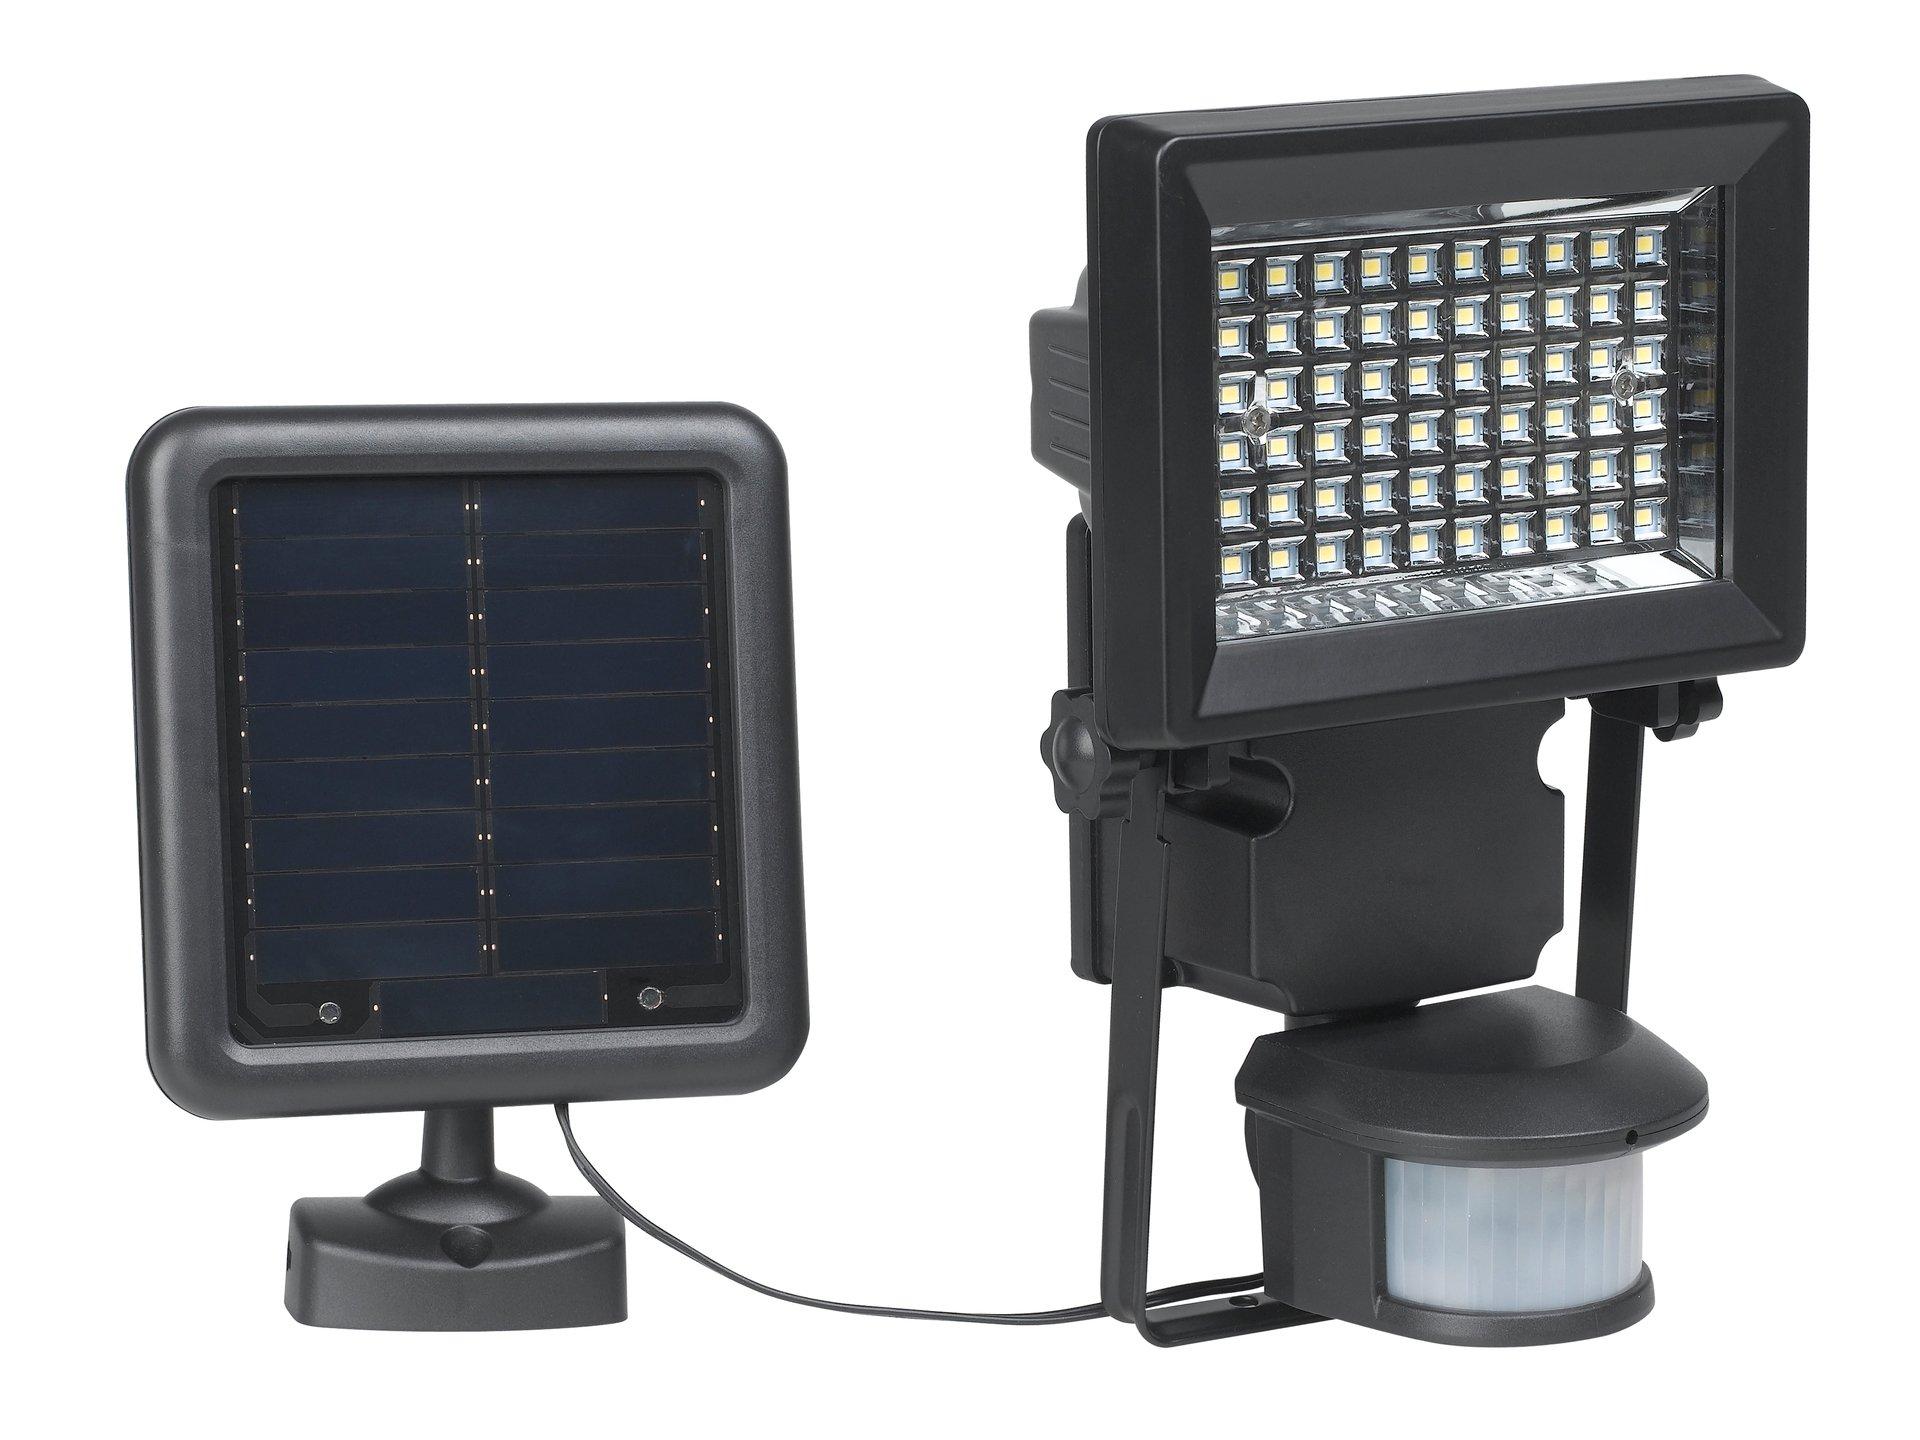 Buitenlamp Met Sensor Gamma.Buitenlamp Met Sensor Zonne Energie Gamma Archidev